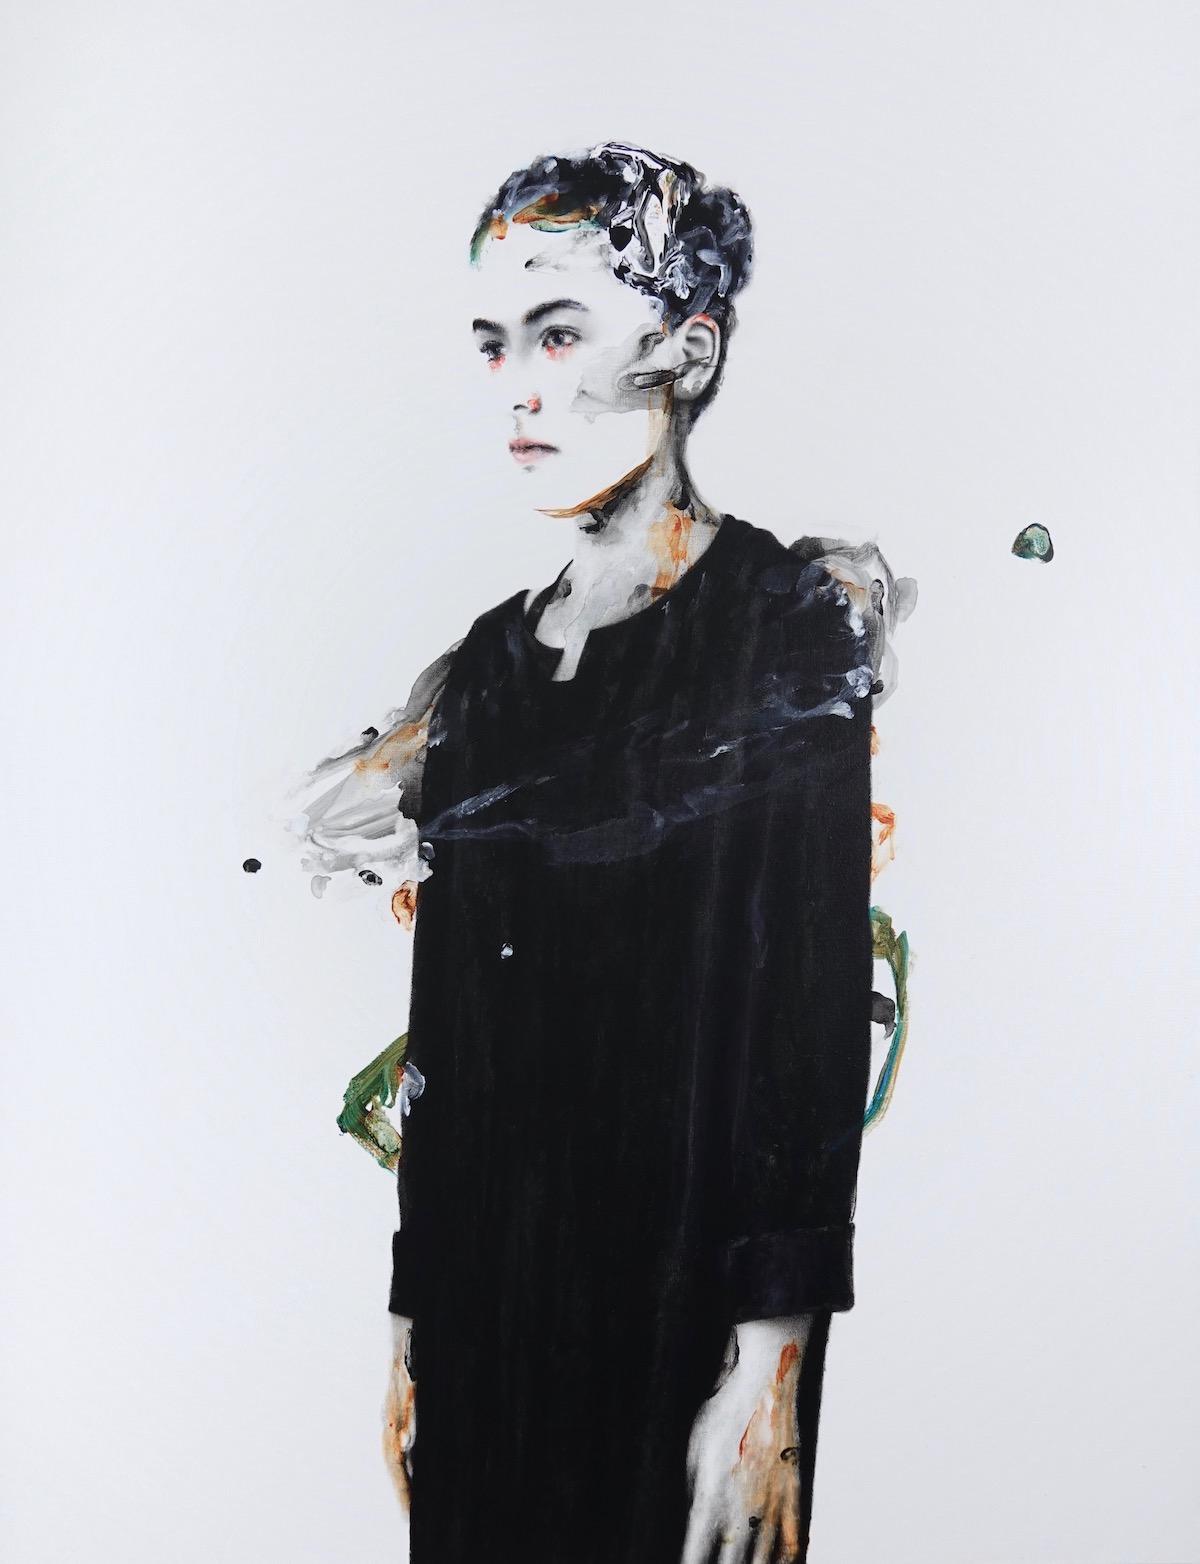 antoine cordet canvas toile peinture painting portrait art artist artiste peintre acrylic oil the smell of thoughts